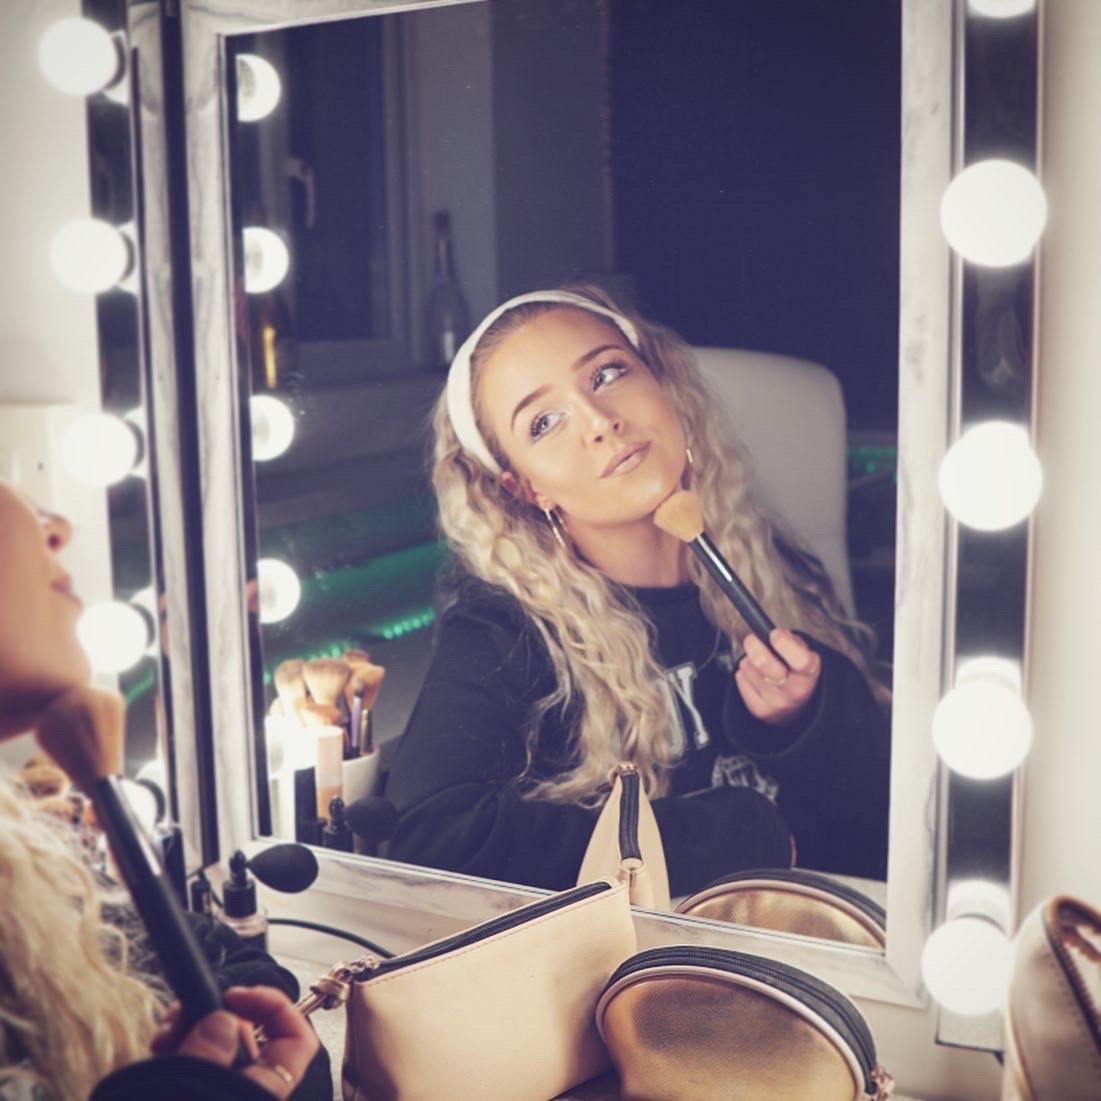 Getting dressed up to go nowhere is fun 🙈   #lockdown #Quarantine #QuarantineLife #fresh #new #girl #singer #love #tbt #photooftheday #instamood #iphonesia  #bestoftheday #selfie #music #fun #music #songwriter